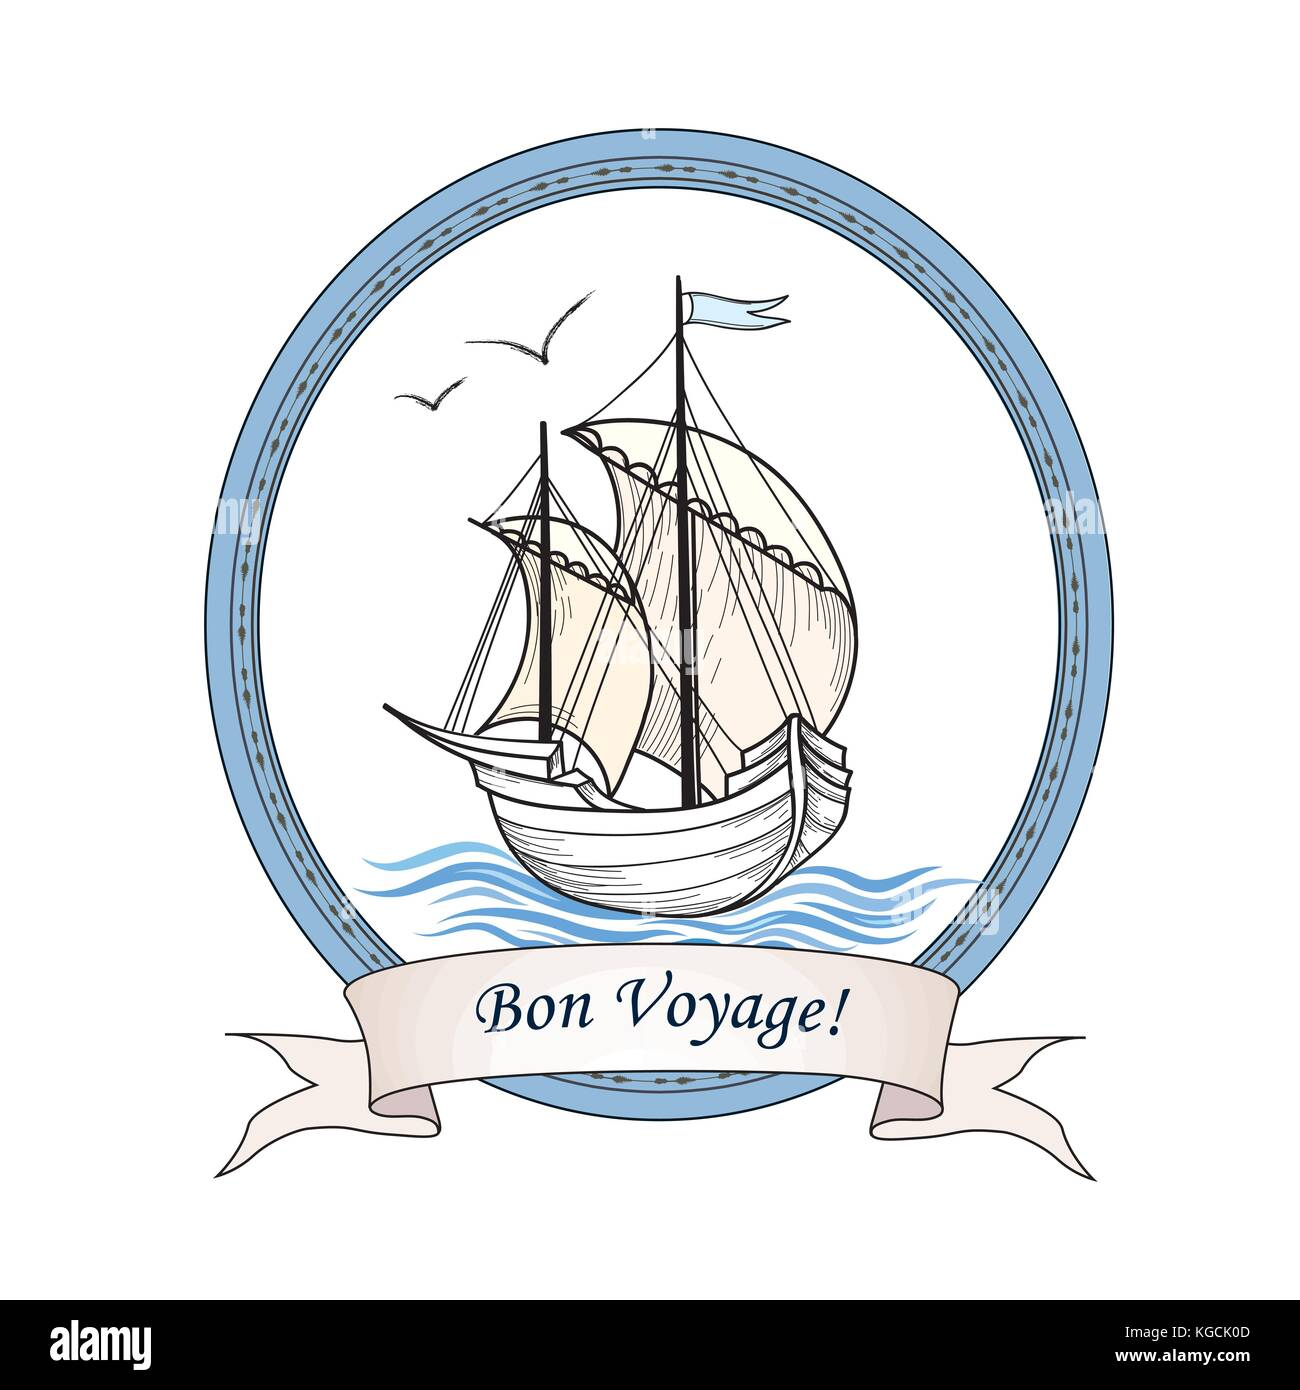 Bon Voyage Stock Photos Amp Bon Voyage Stock Images Alamy